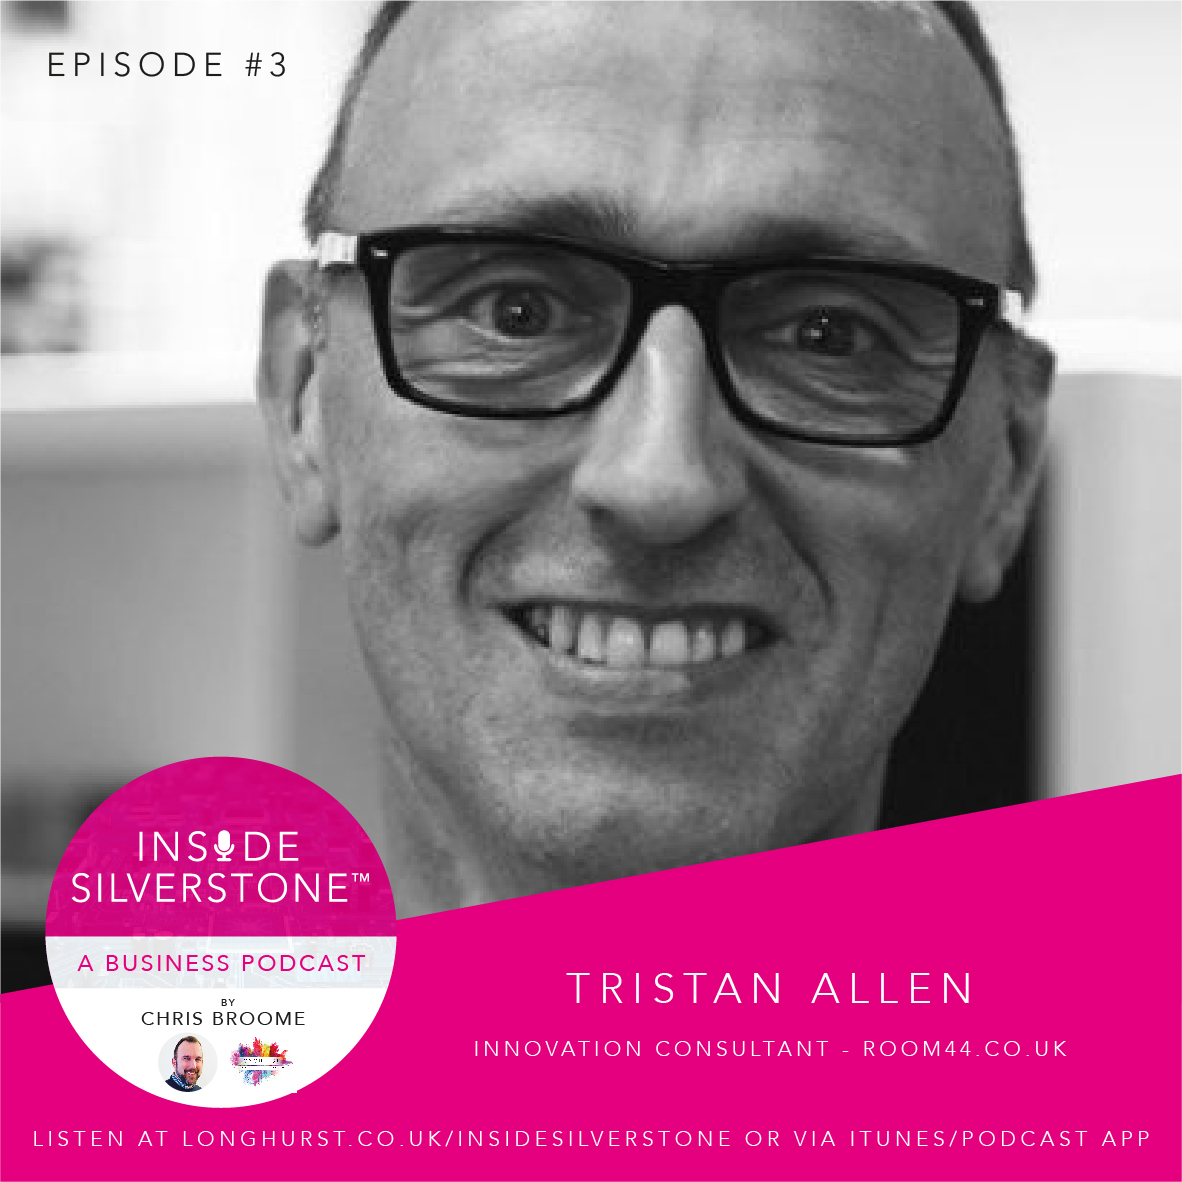 Tristan Allen, Partner & Innovation Consultant at room44.co.uk